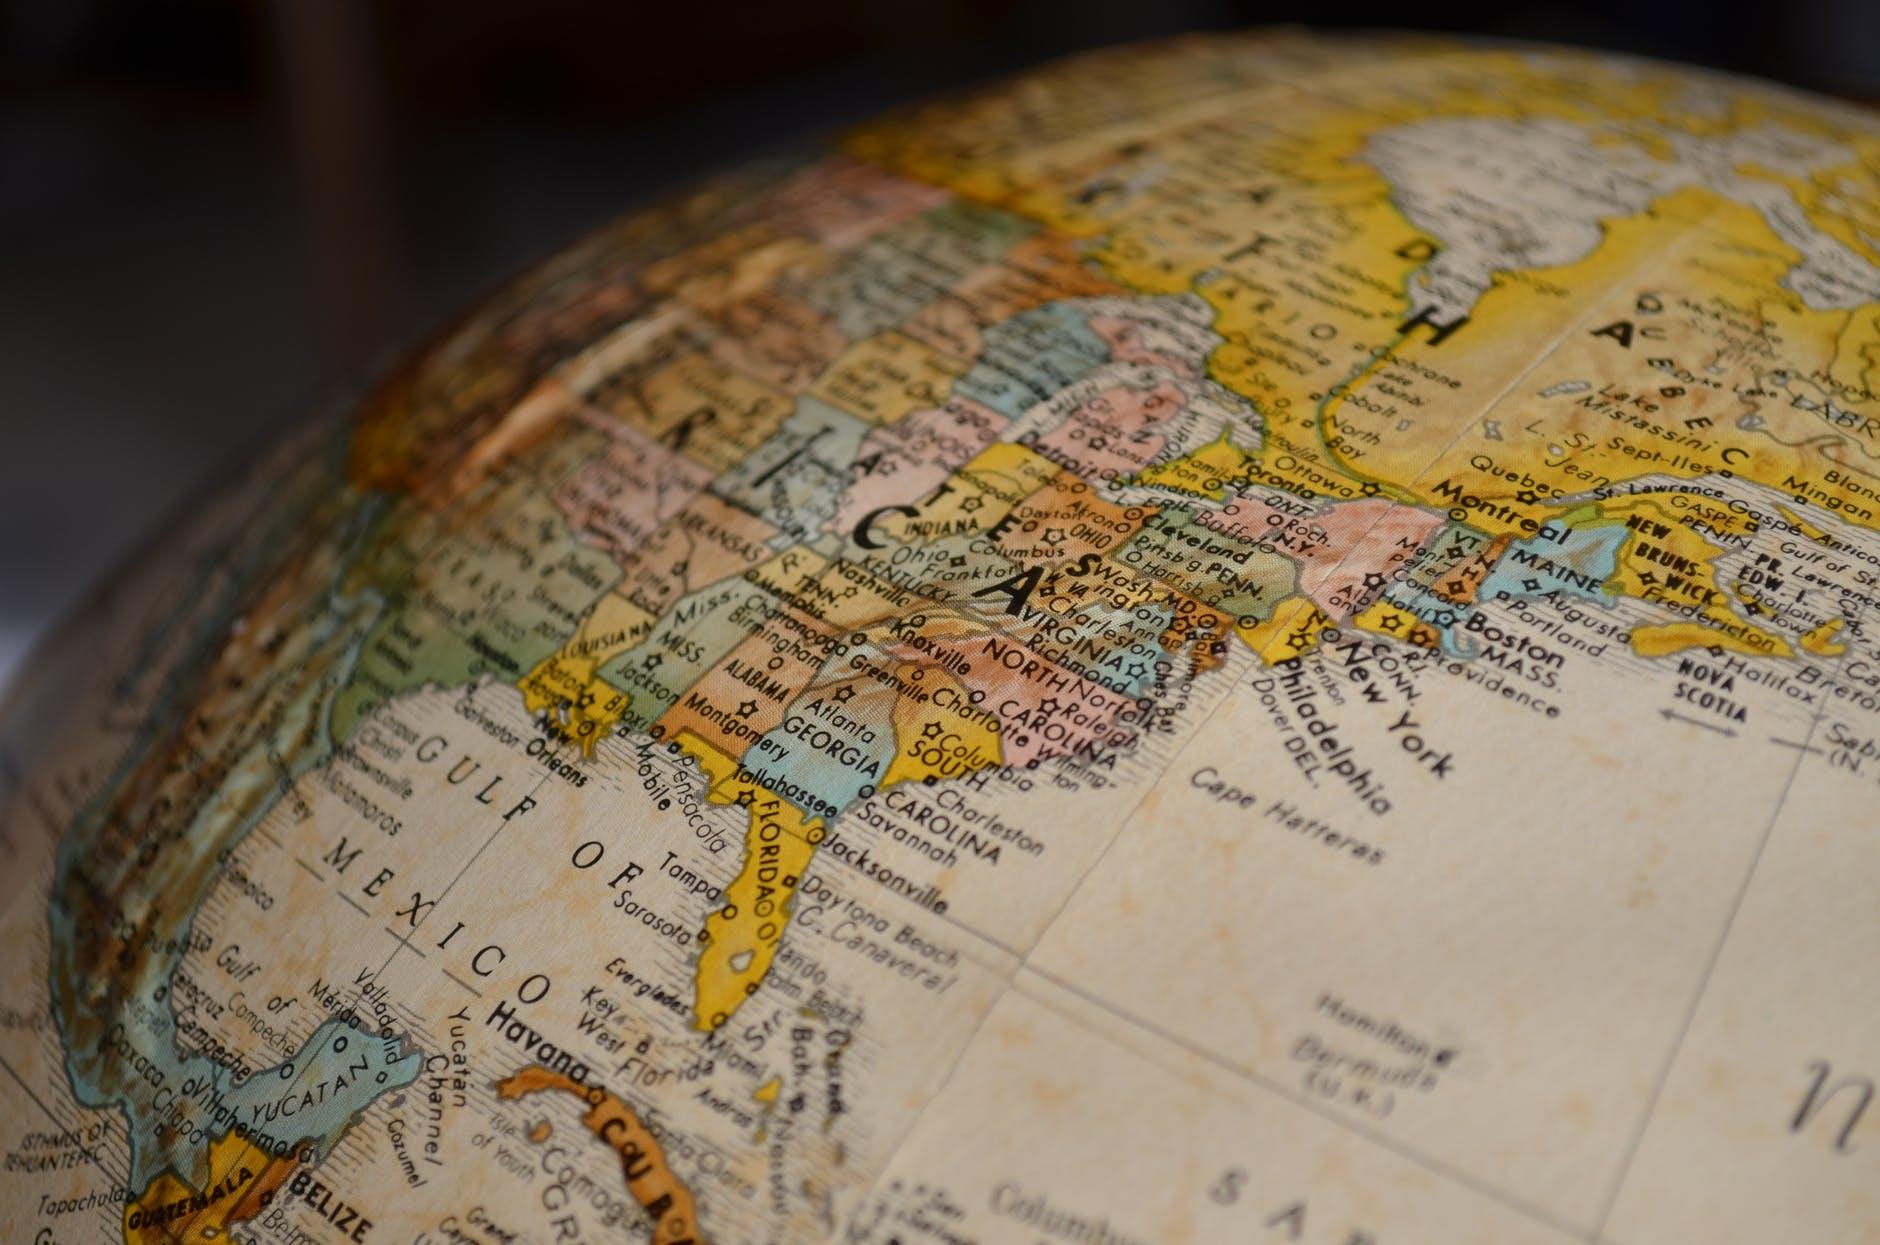 A globe showing American terrain.